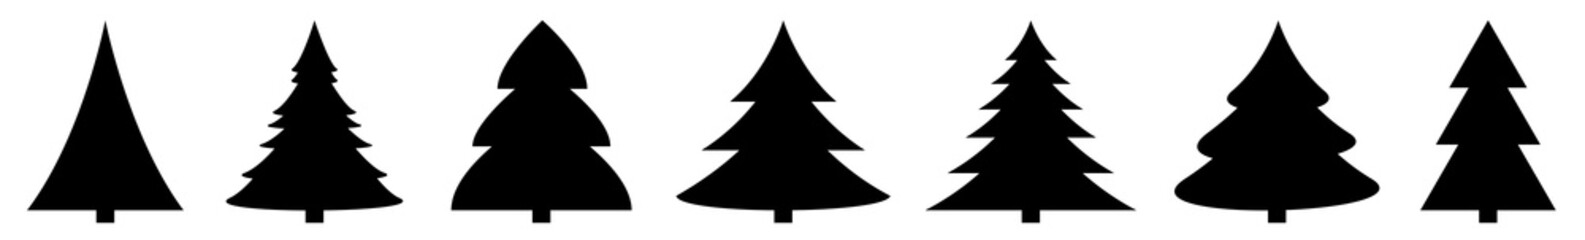 Fototapeta Christmas Tree Black Icon | Fir Tree Illustration | x-mas Symbol | Logo | Isolated Variations obraz